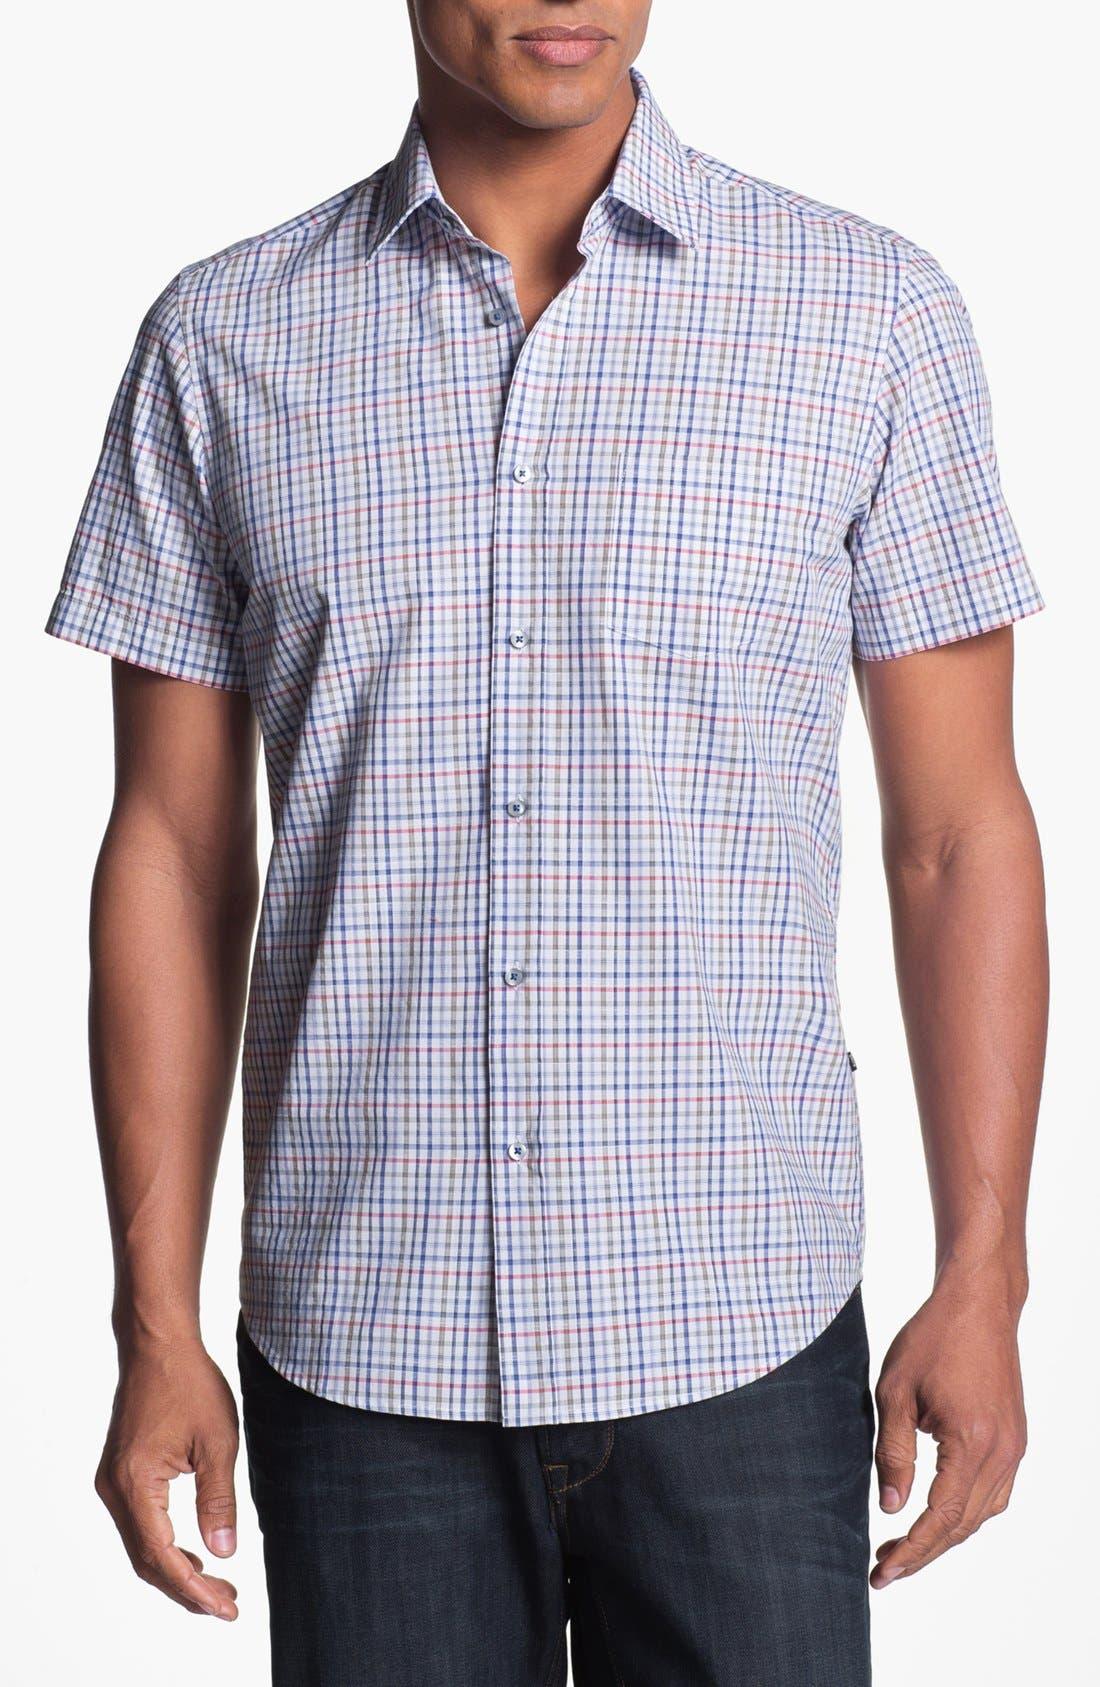 Main Image - BOSS HUGO BOSS 'Kenny' Regular Fit Plaid Short Sleeve Sport Shirt